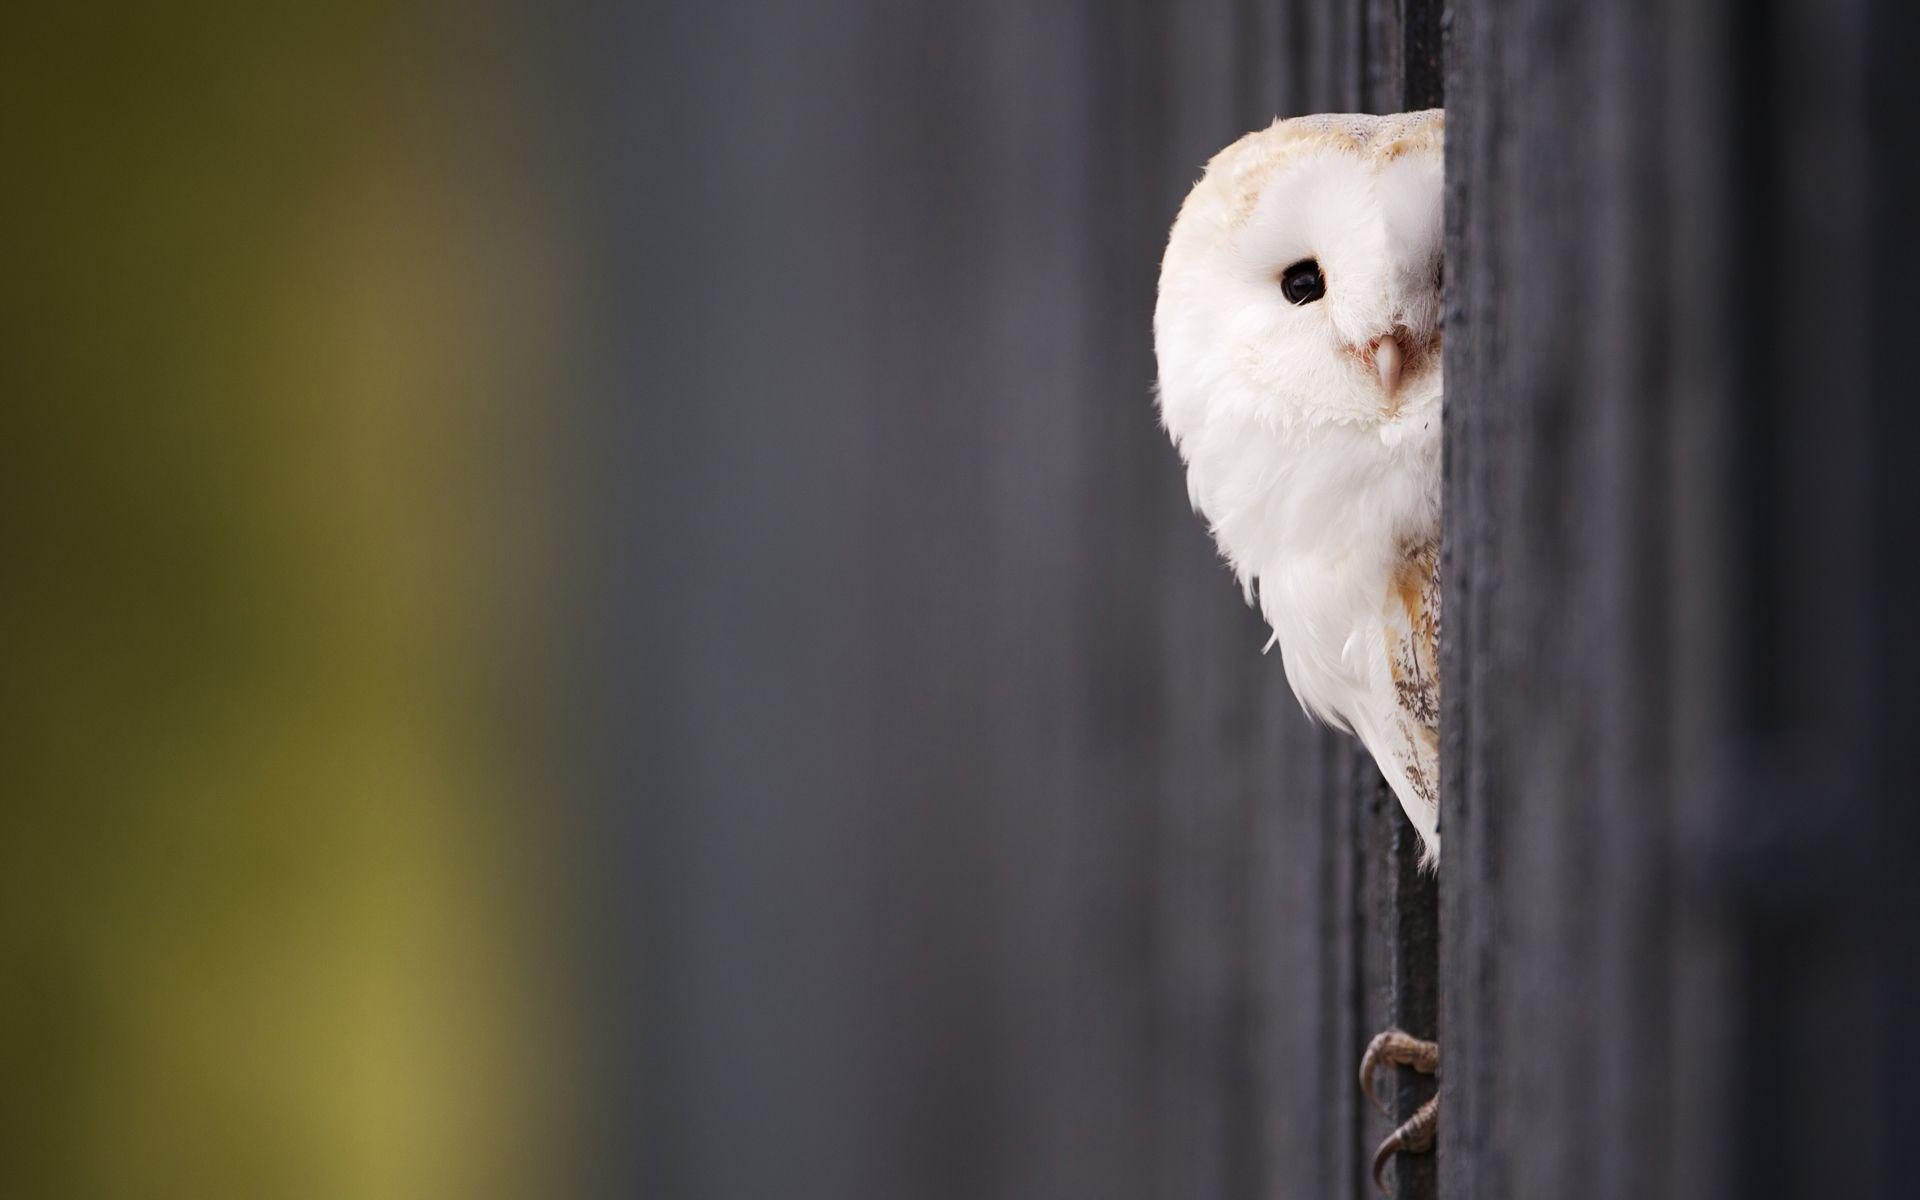 Peeking Owl Wallpaper Pet Birds Owl